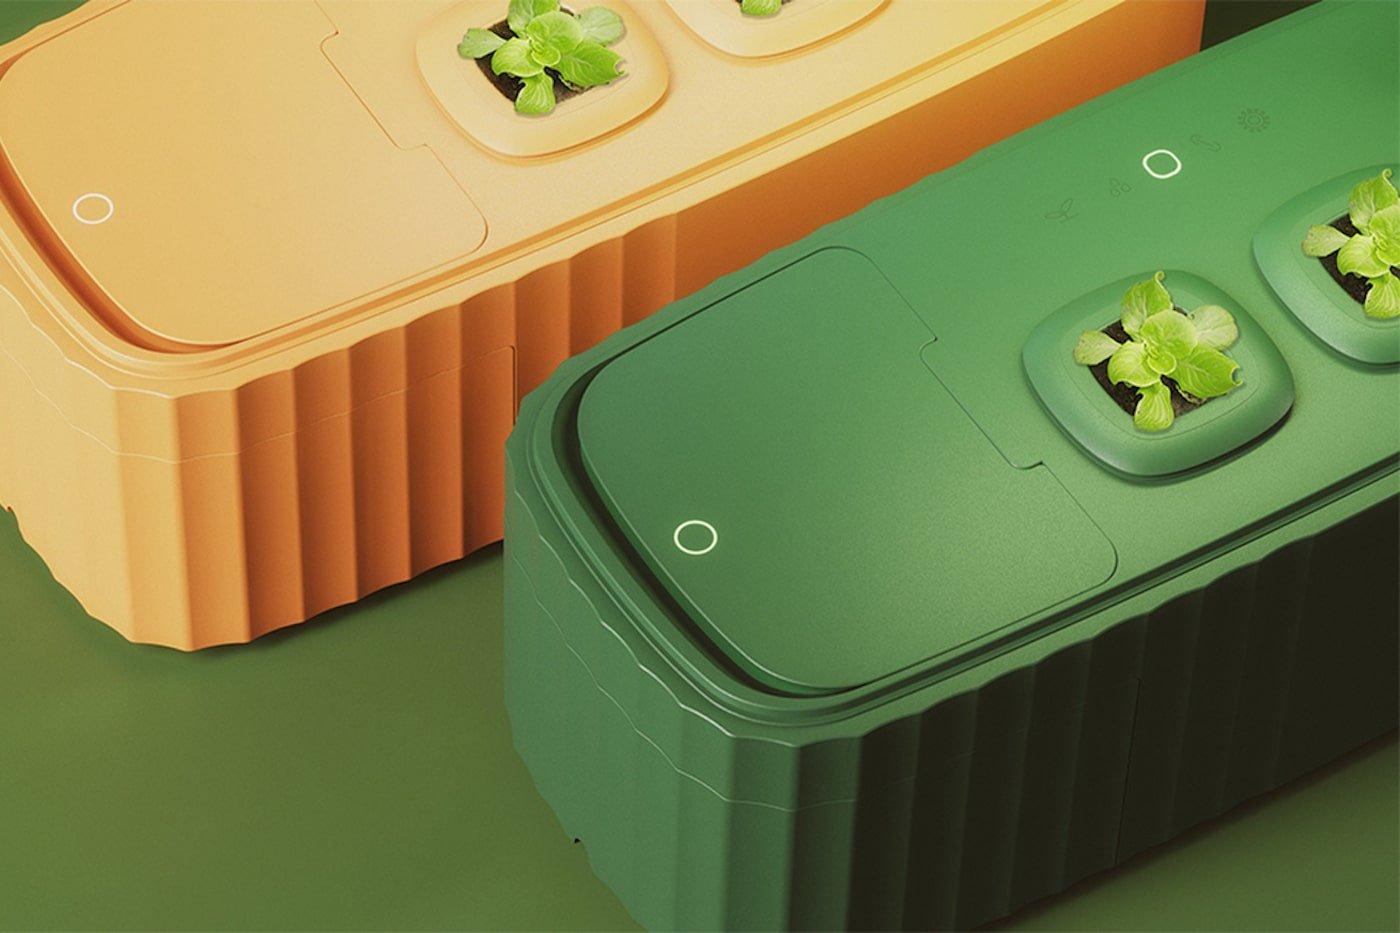 Orange and green counter top compost bin and garden planter